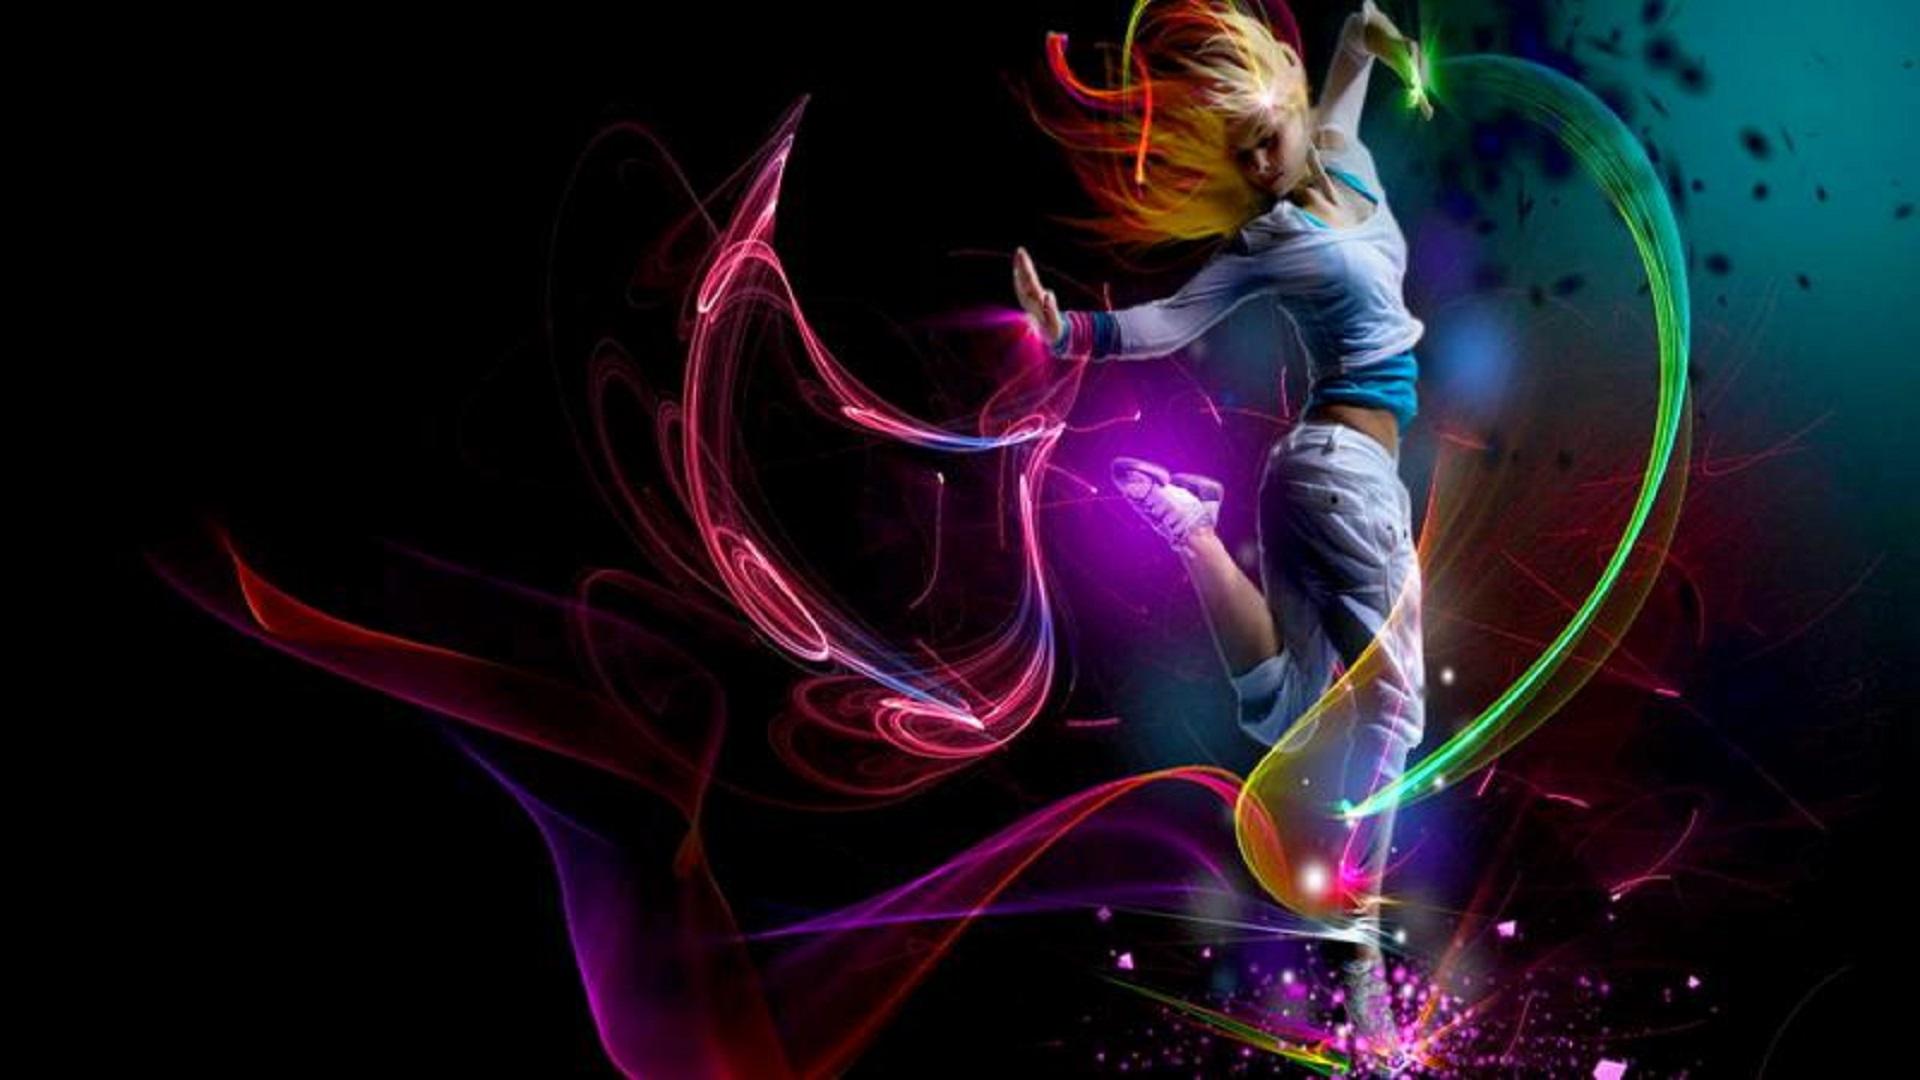 Music Wallpaper Hd Apk Download: 3d-abstract_hdwallpaper_dancing-girl_free-hd-wallpapers